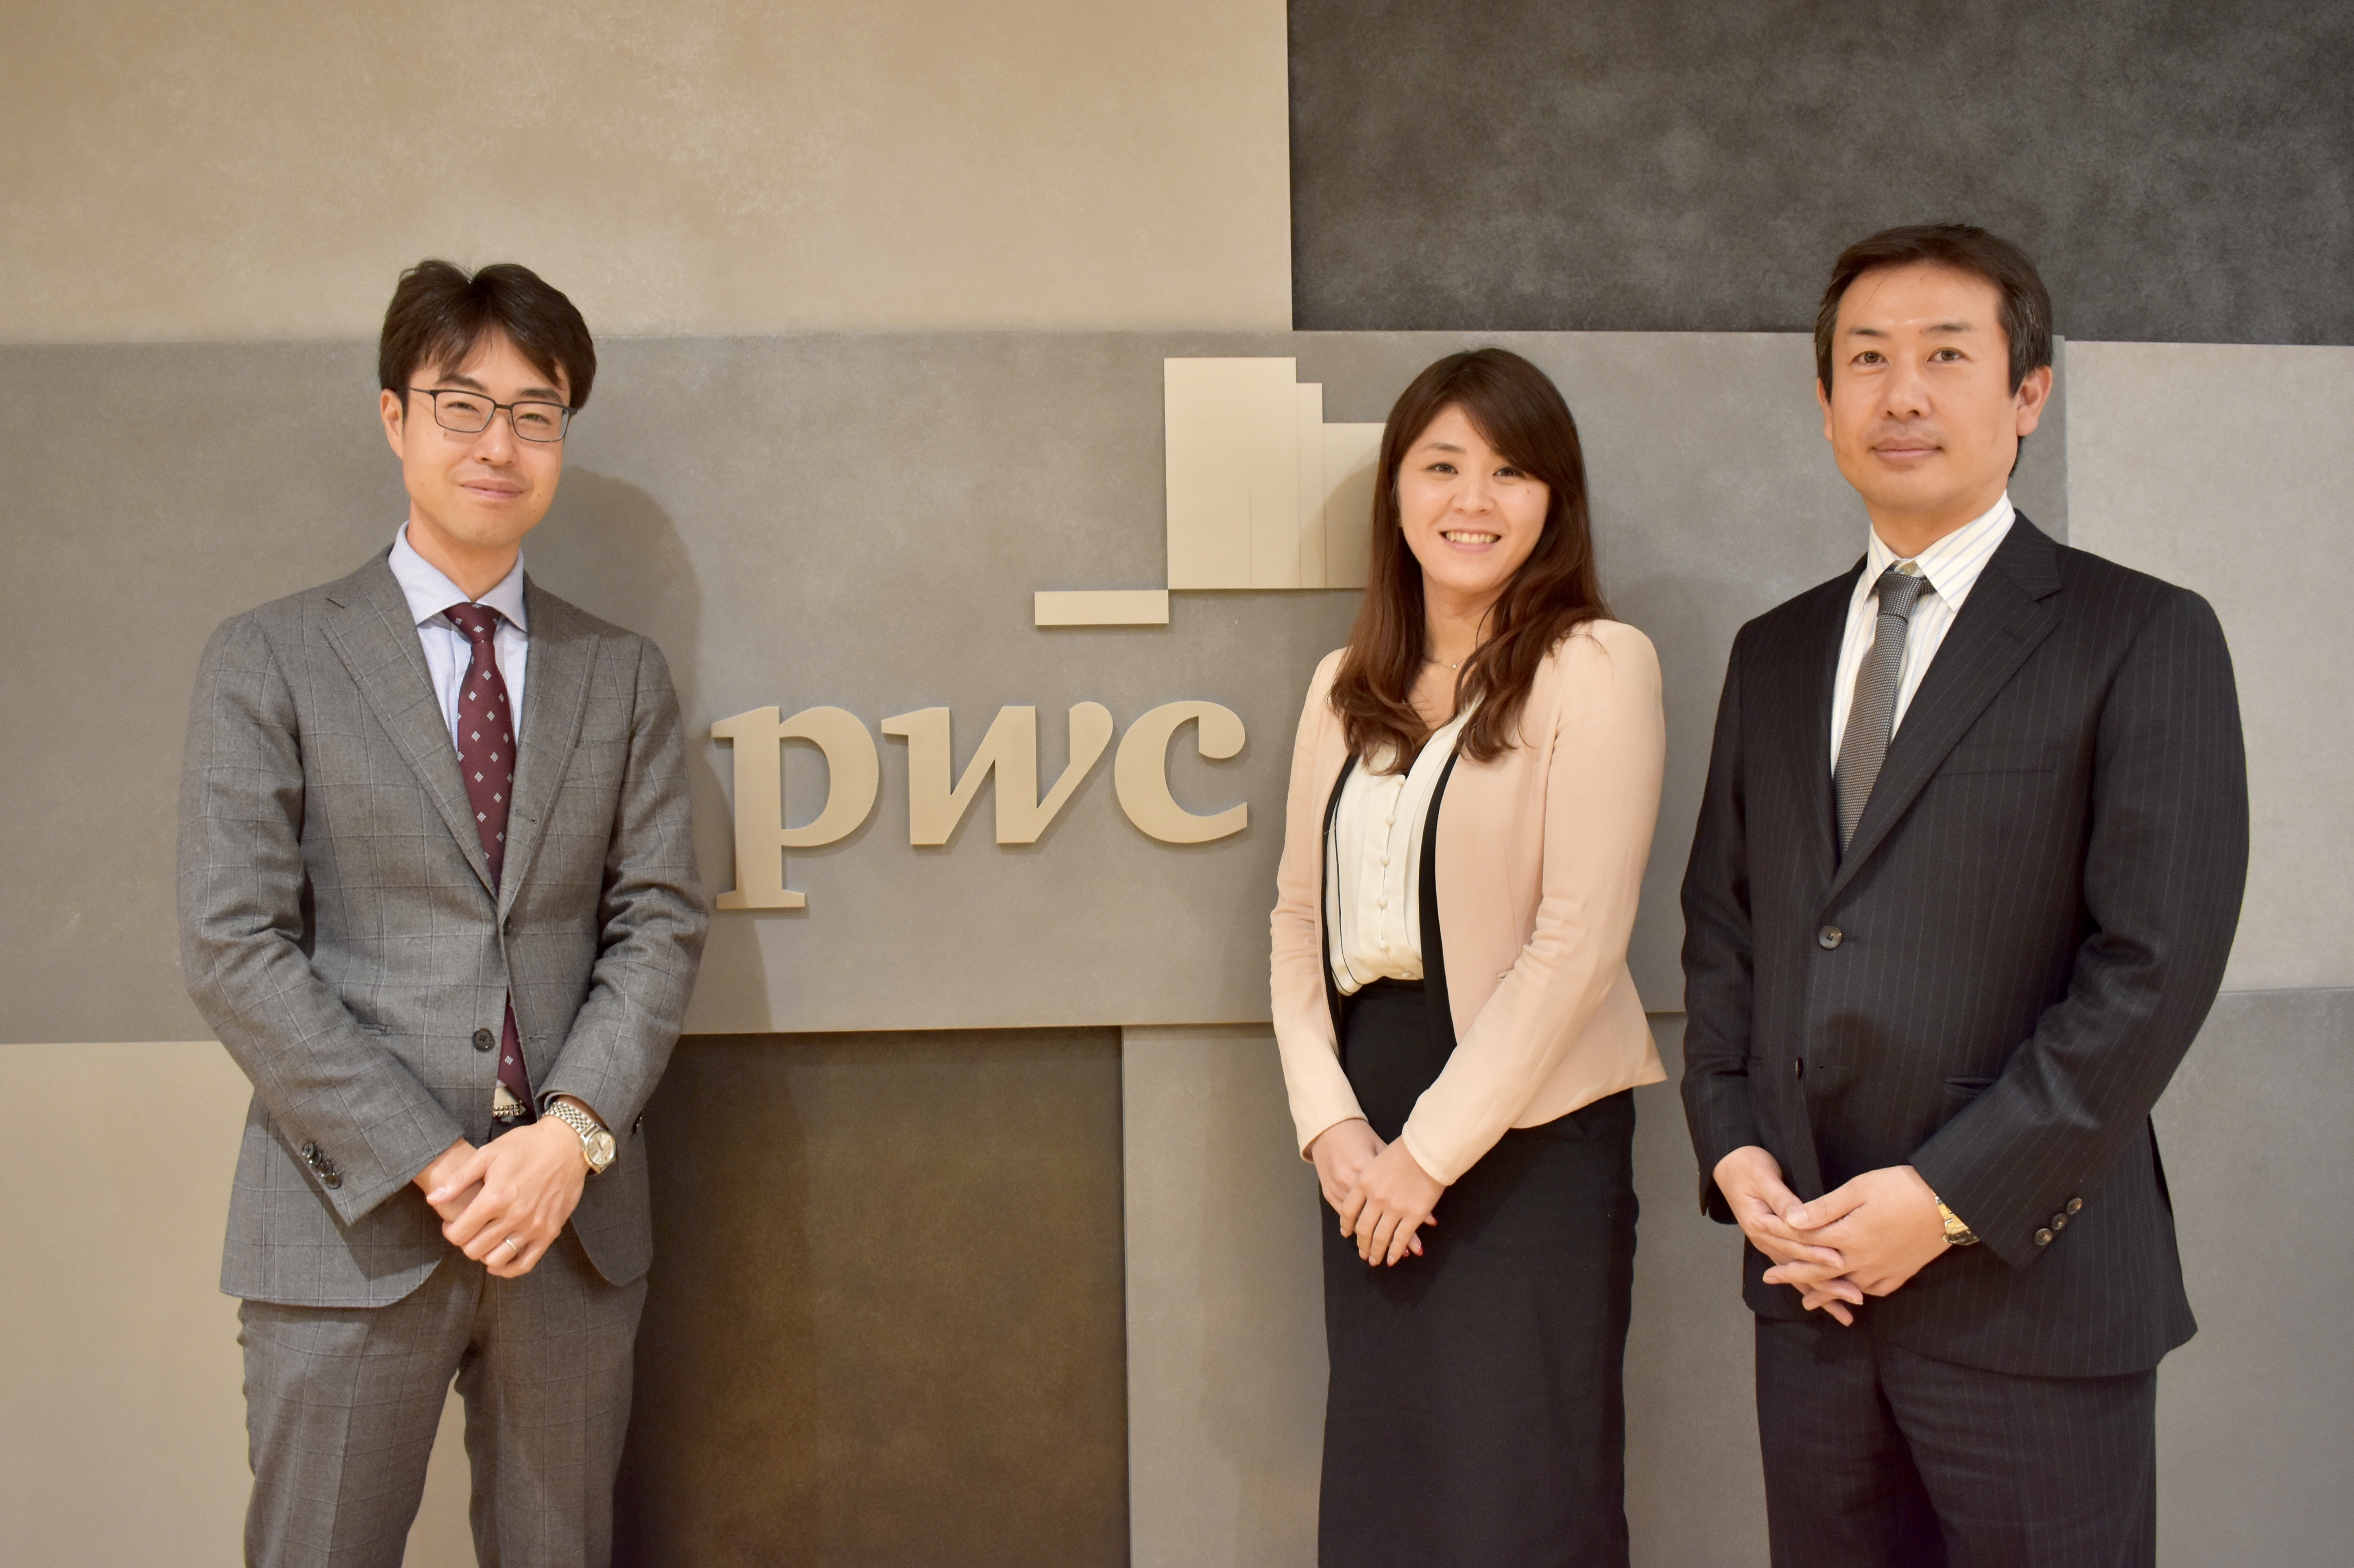 PwC3人の写真